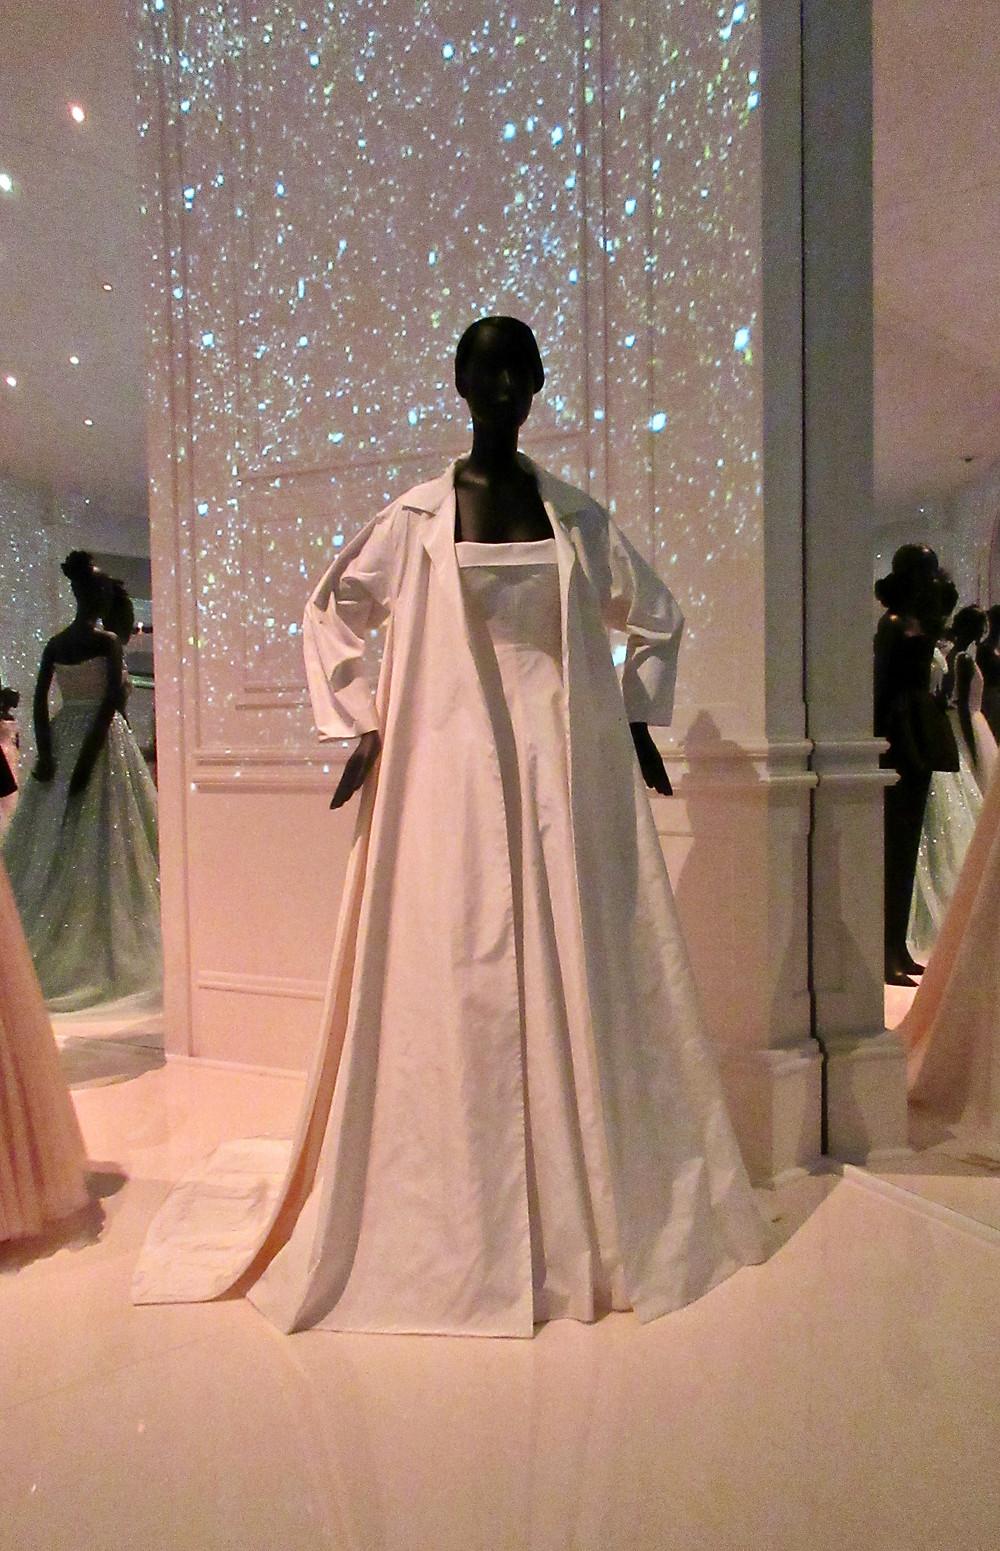 Dress worn by Rhianna to Canne Film Festival in May 2017. Maria Grazia Chiuri bespoke silk taffetta.